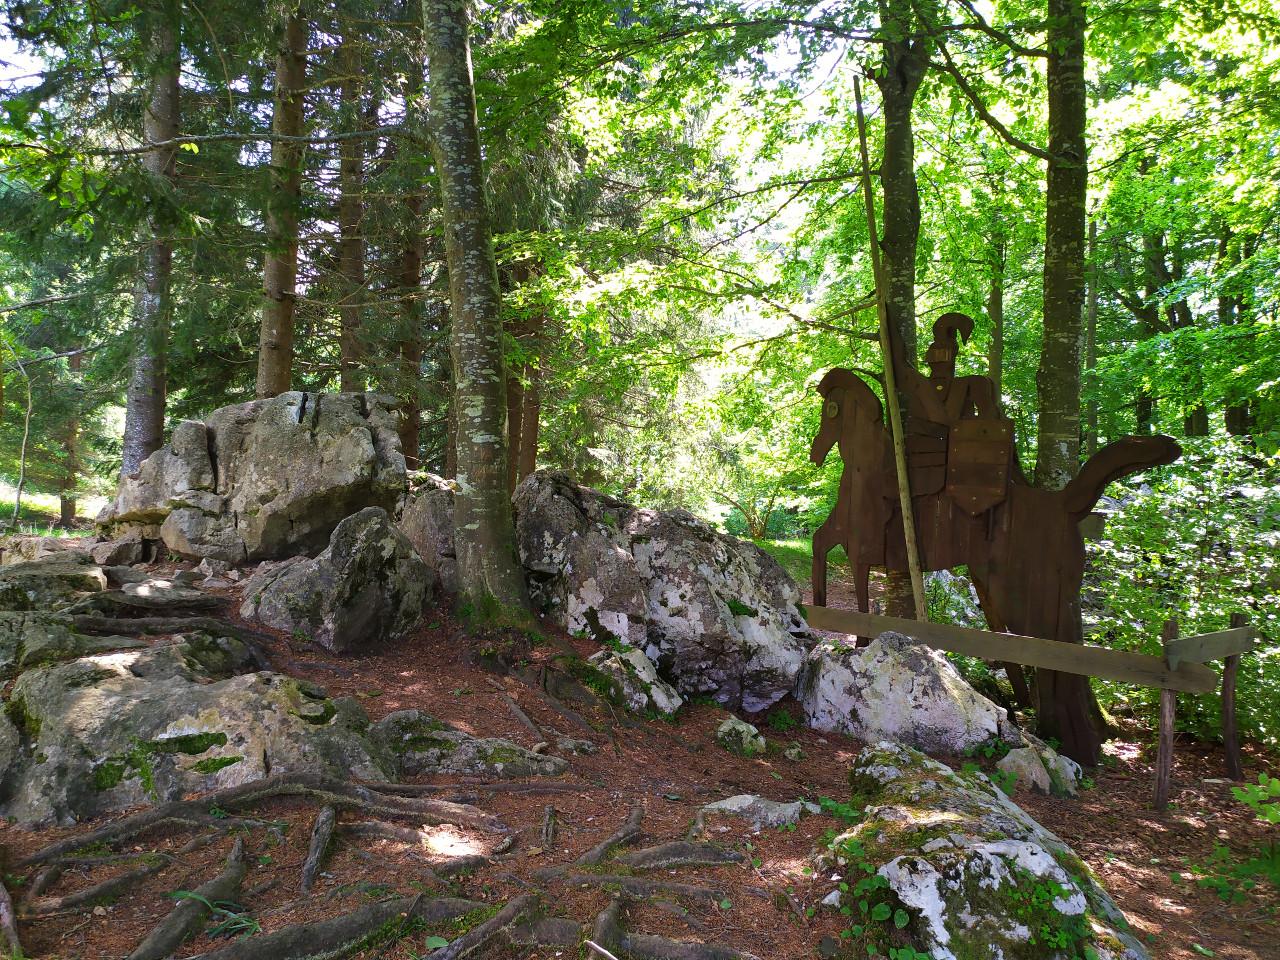 sentiero excalibur tonezza del cimone